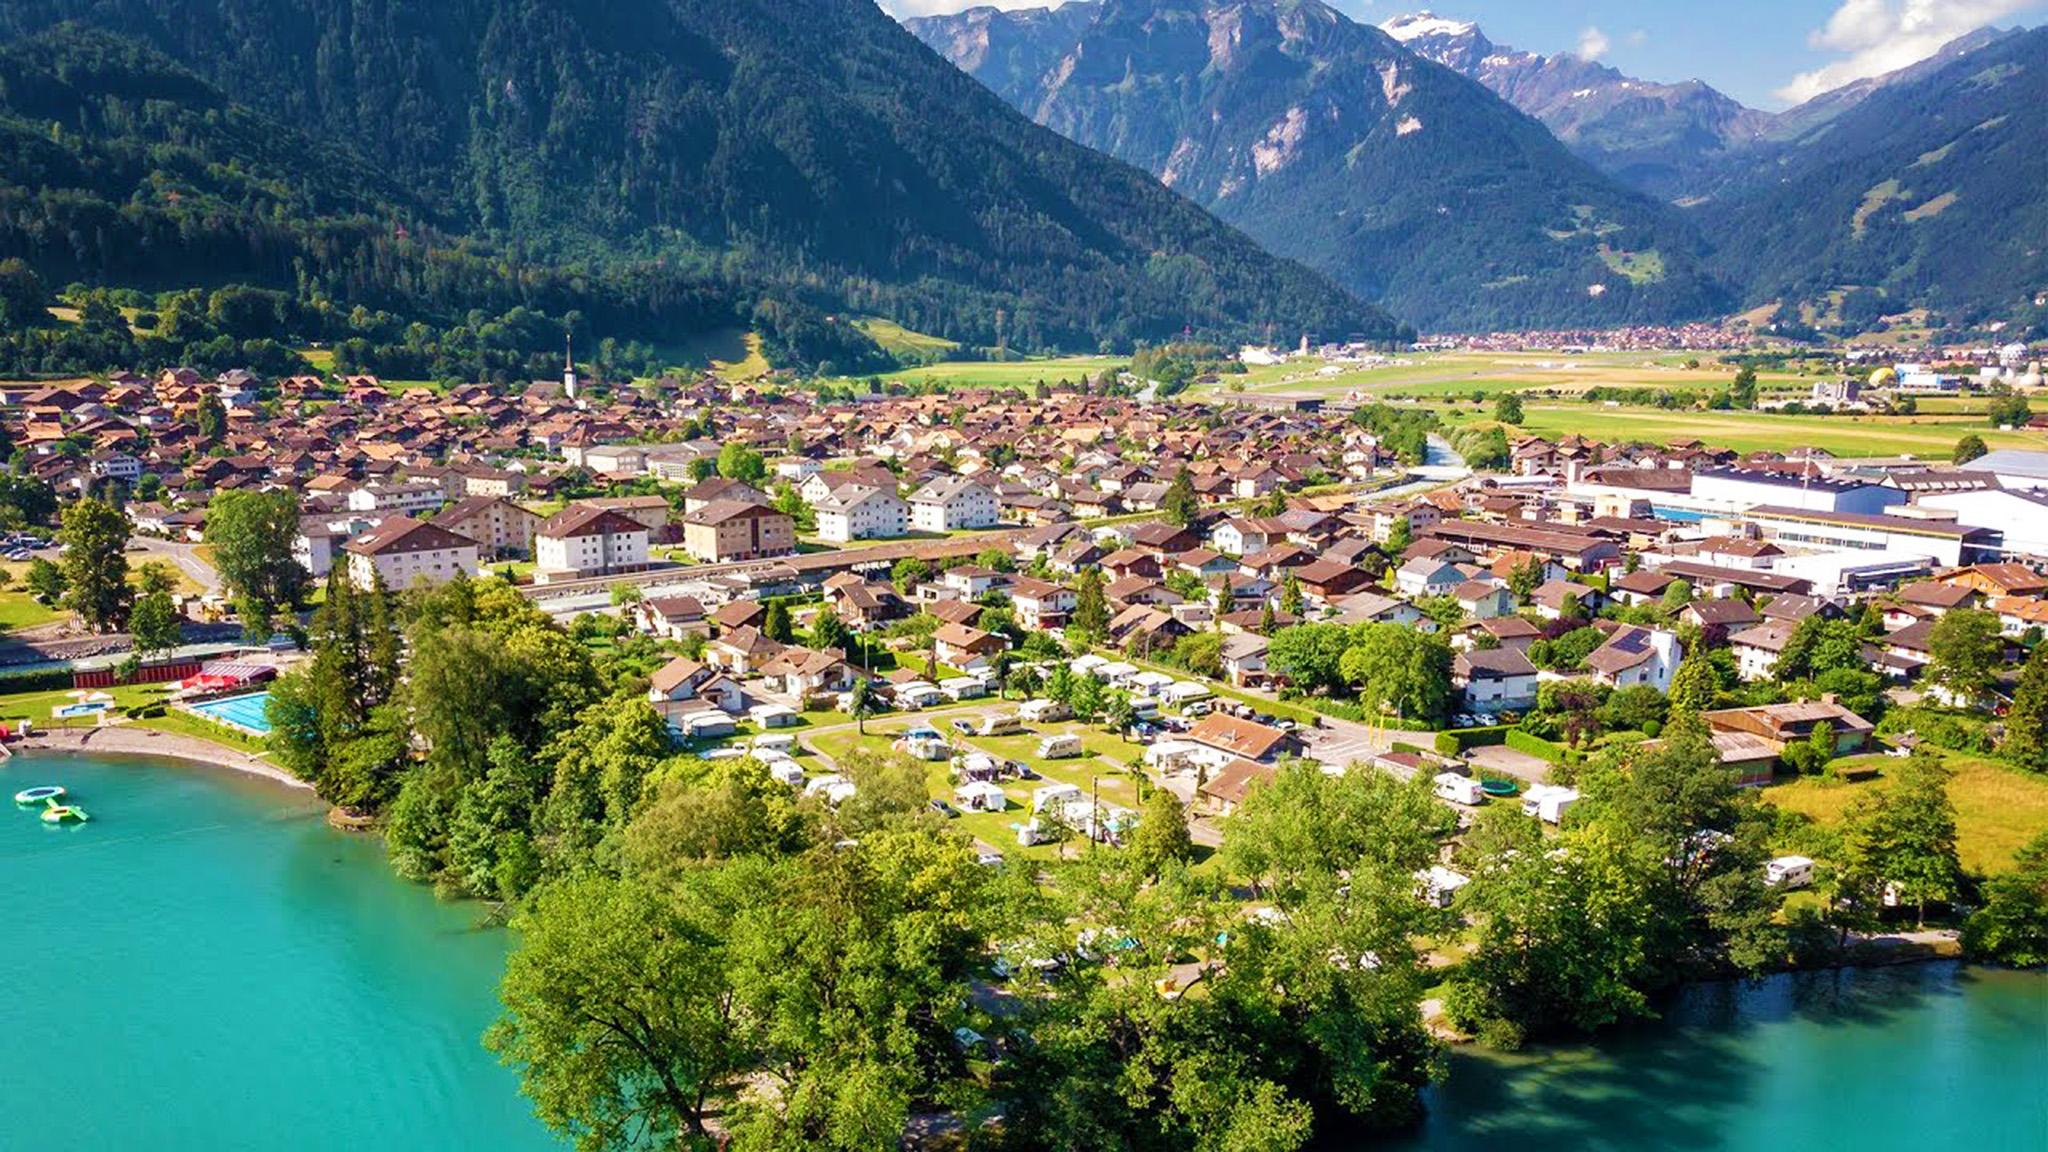 kt_2020_360_Keytours_excursions_Swisstours_interlaken_village5_2048_10